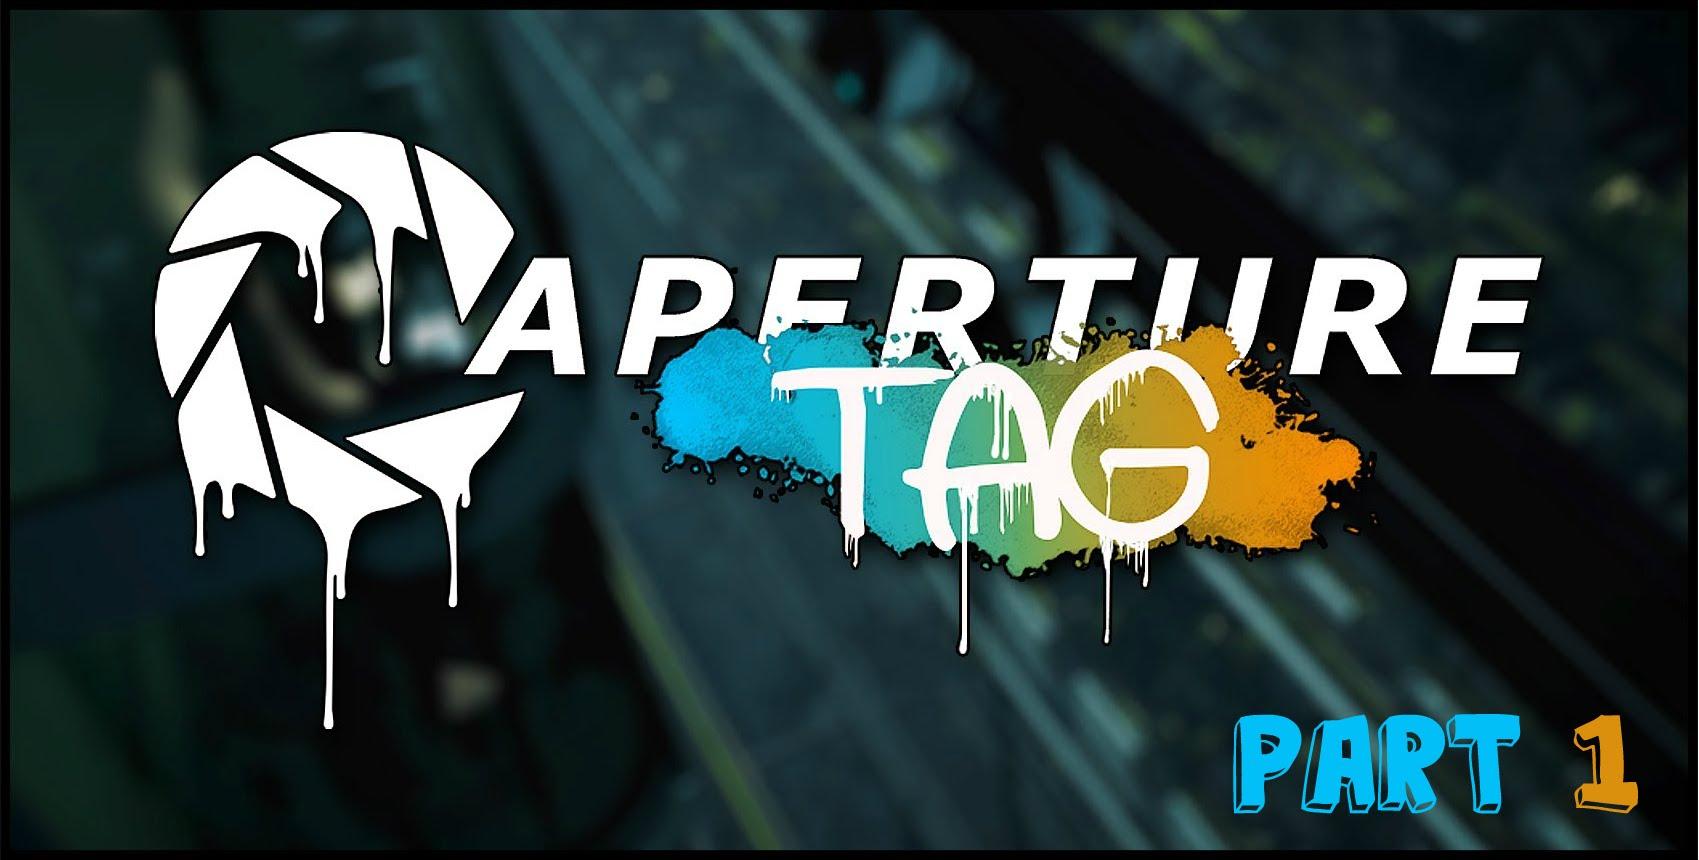 Aperture Tag: The Paint Gun Testing Initiative Backgrounds, Compatible - PC, Mobile, Gadgets  1699x860 px